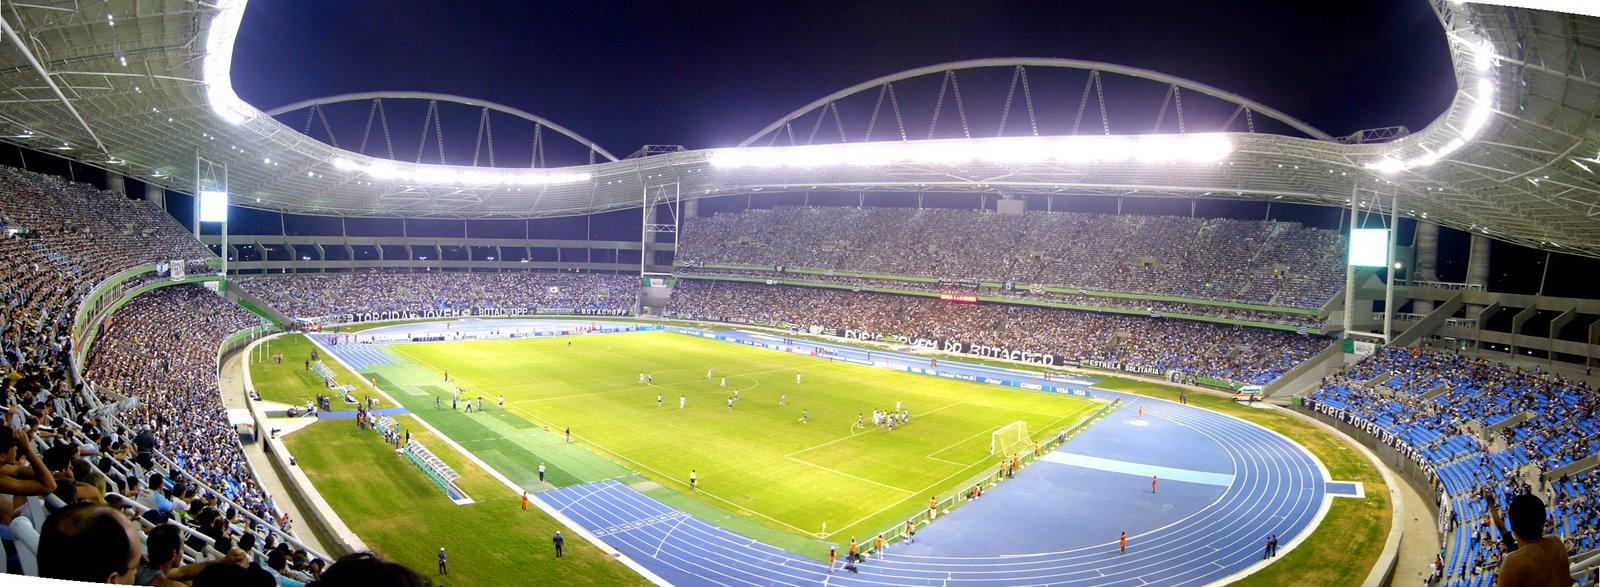 Joo_Havelange_Stadium_at_night